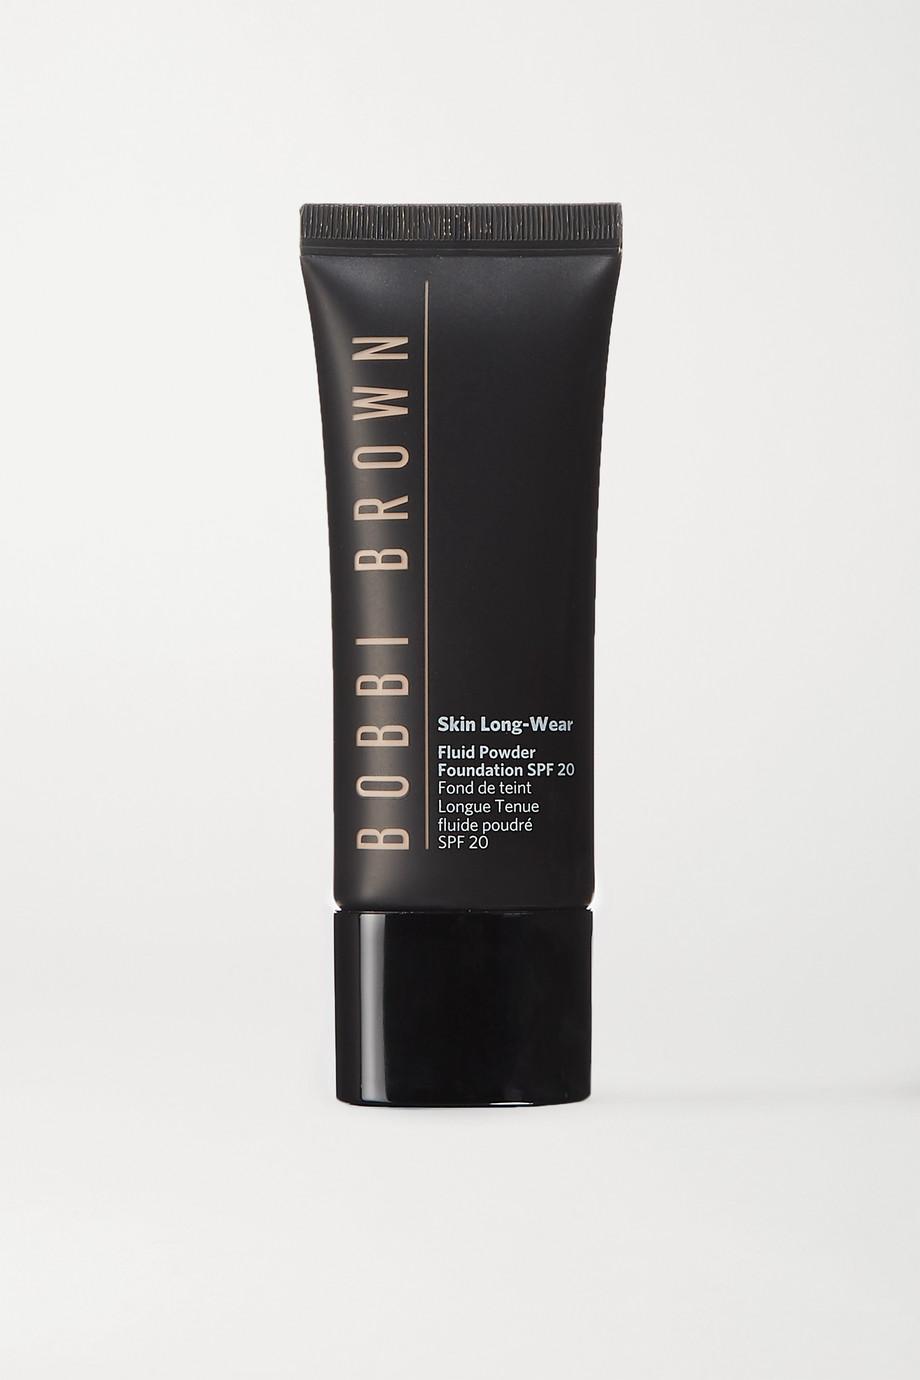 Bobbi Brown Skin Long-Wear Fluid Powder Foundation SPF20 - Warm Porcelain